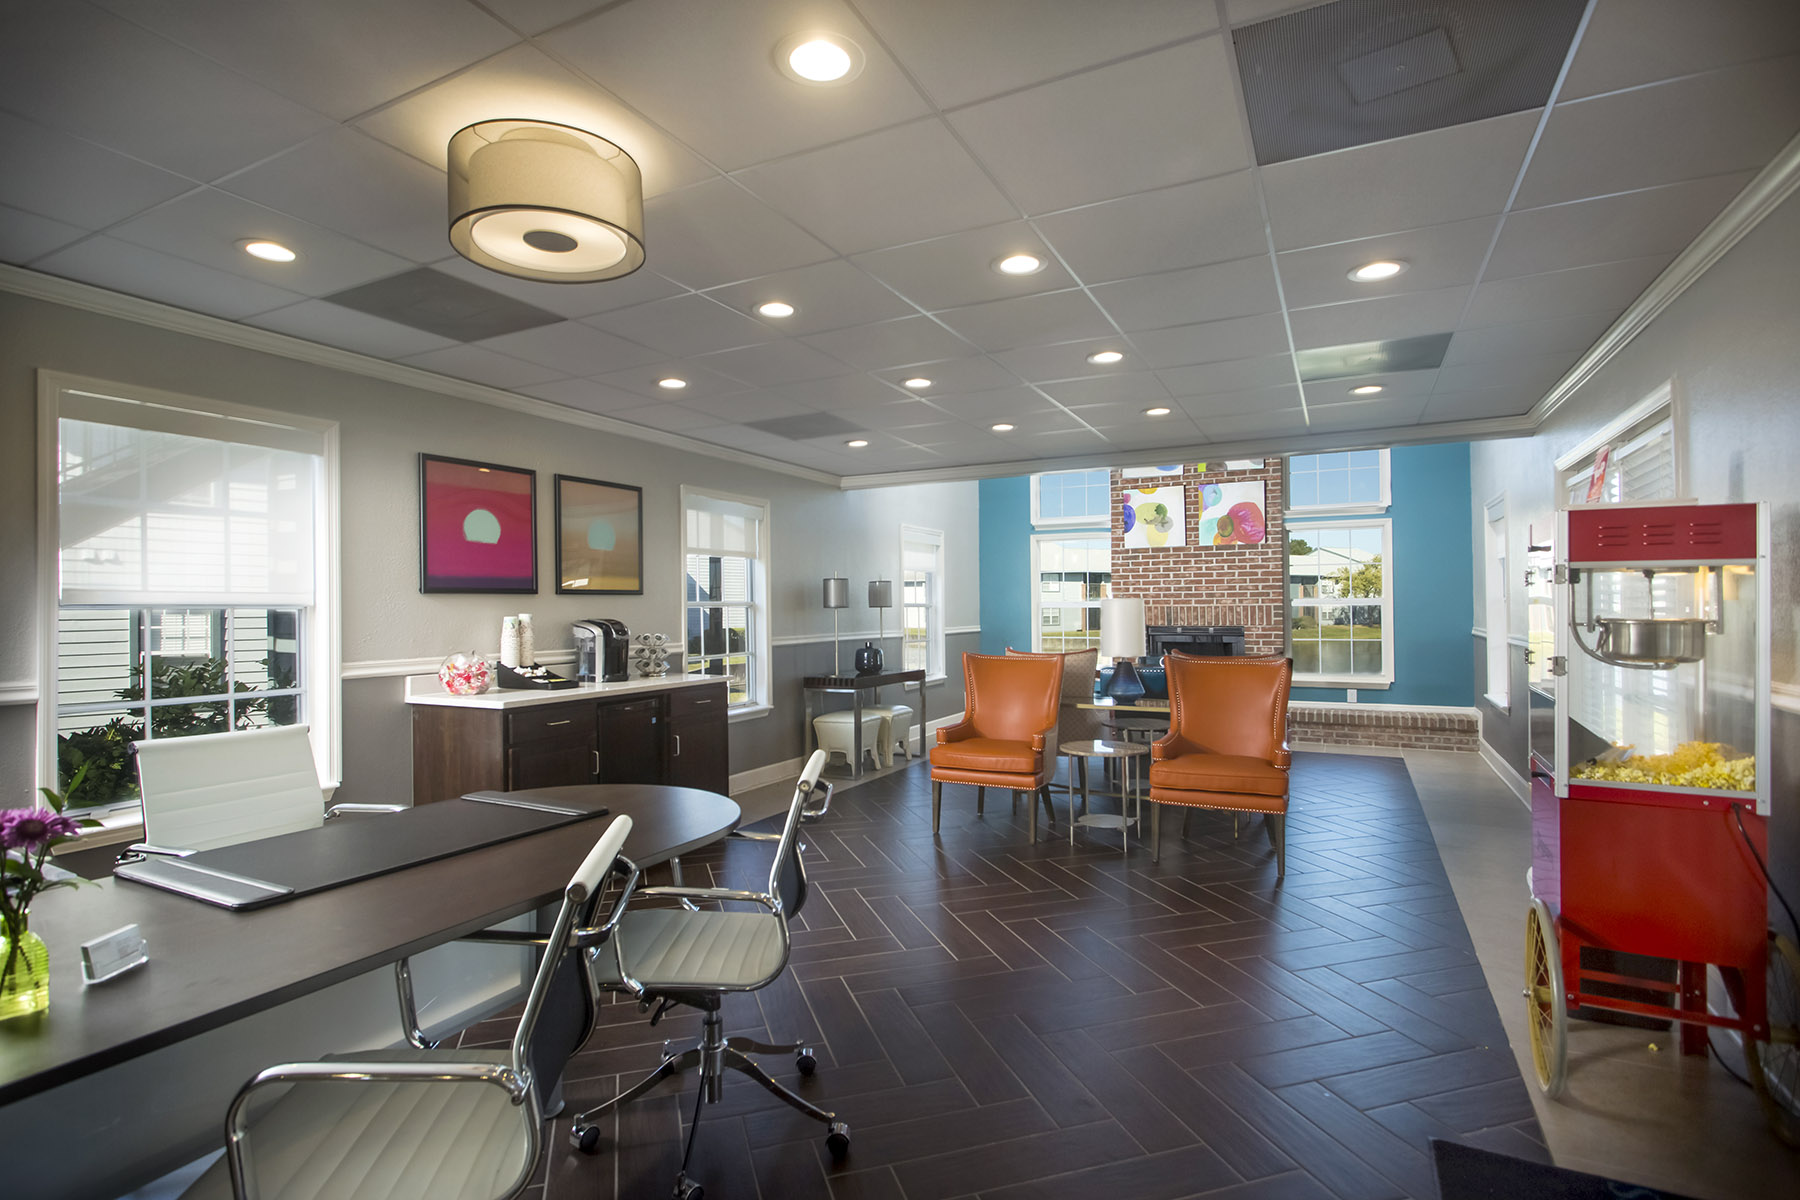 CharlestonEdge-Rental-Apartment-Brandon-Tampa-Florida-Pool-Bedrooms-Amenities-1.jpg